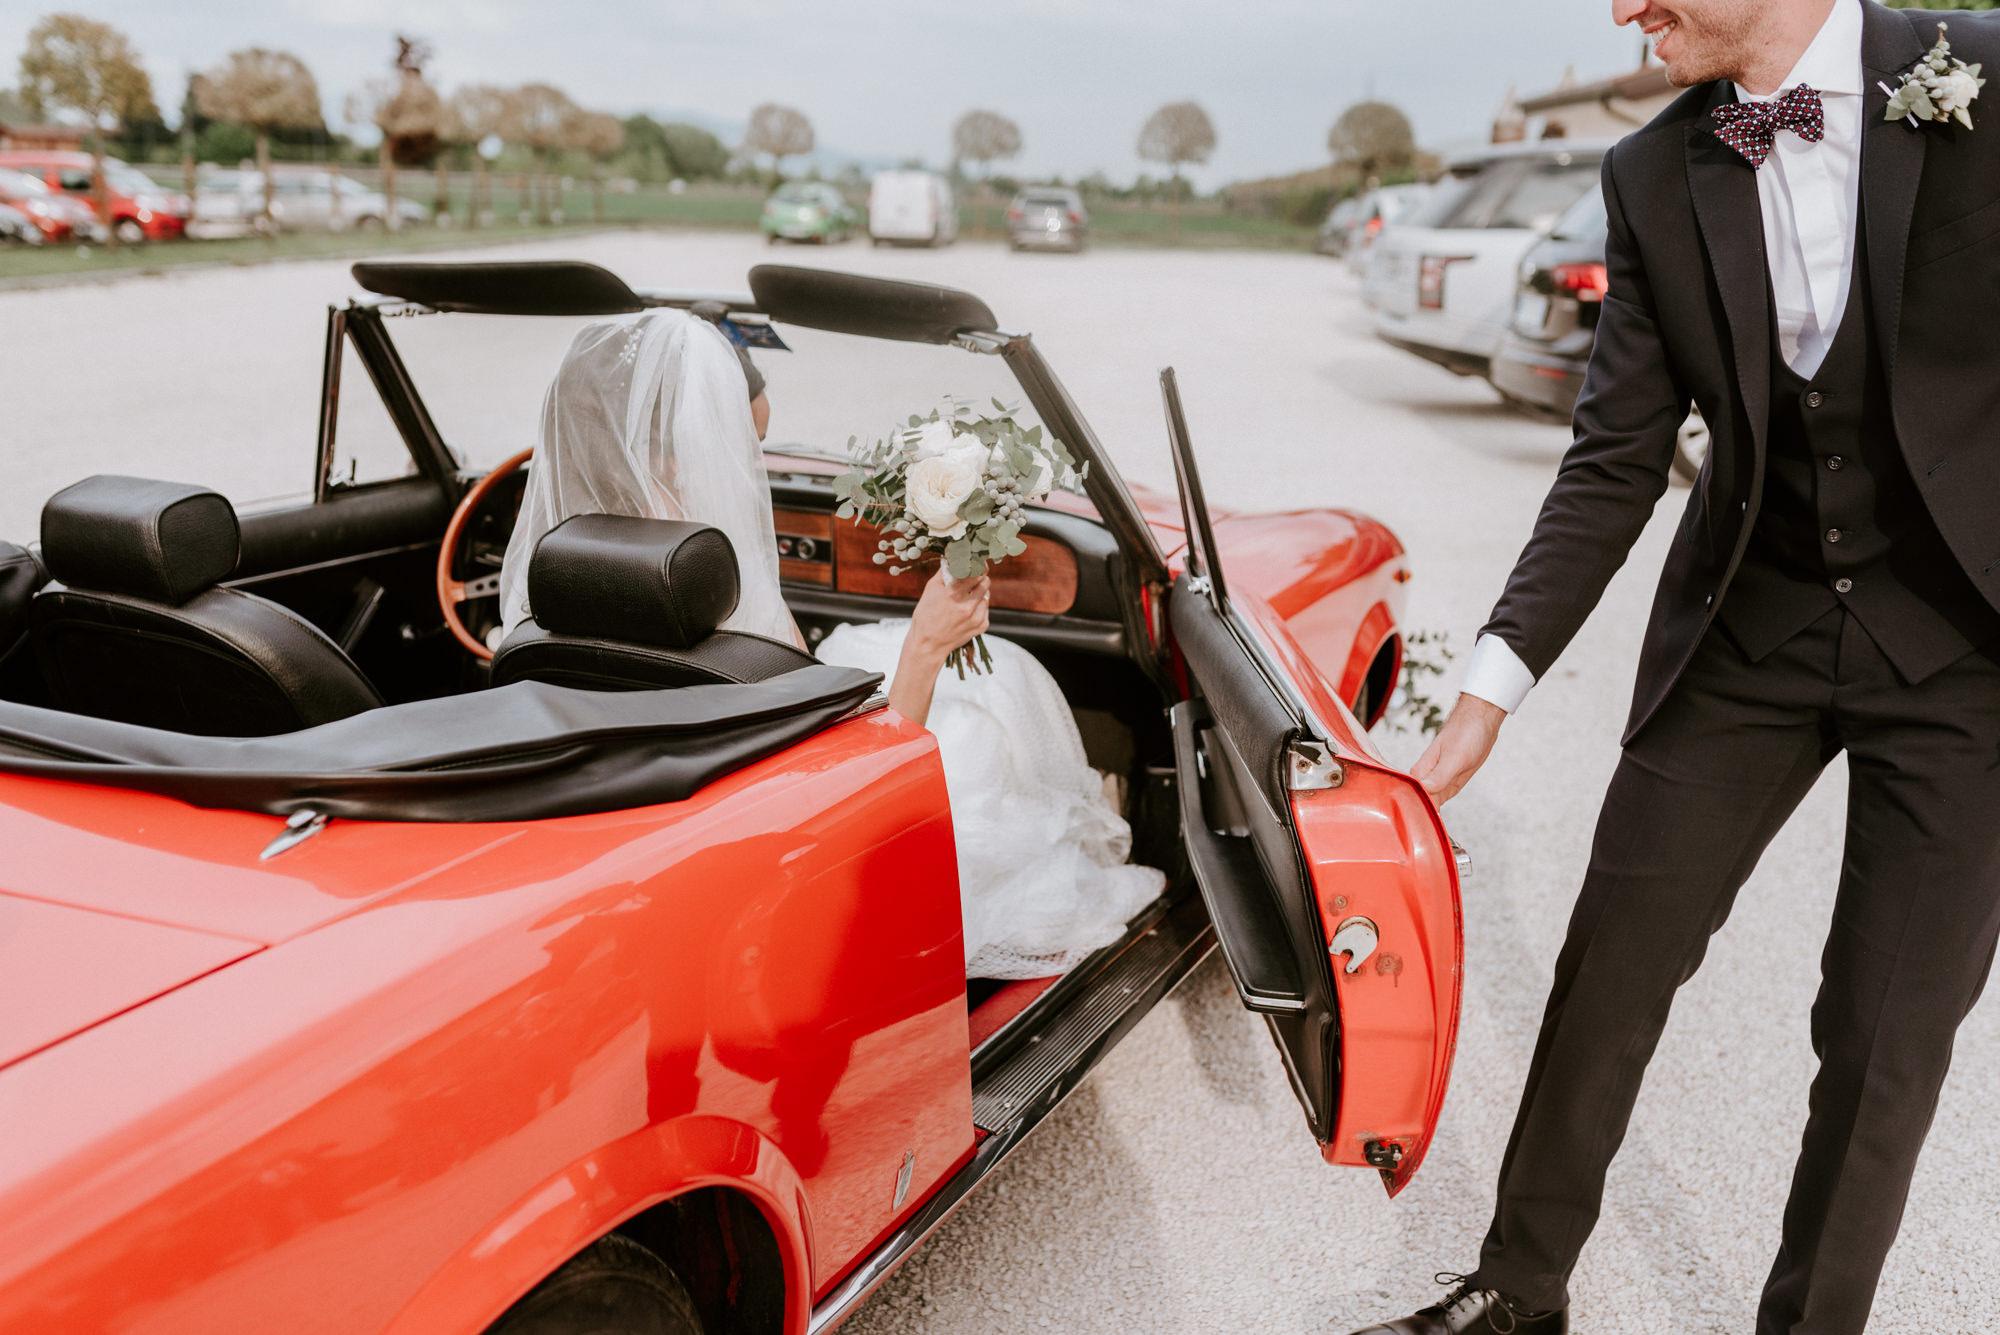 FOTO+PHOTO+BODA+WEDDING+ITALIA+ITALY+MAURICIO+GARAY+MAURICIOGARAY+WEDDINPHOTOGRAPHER+FOTOGRAFODEBODA-1371.jpg